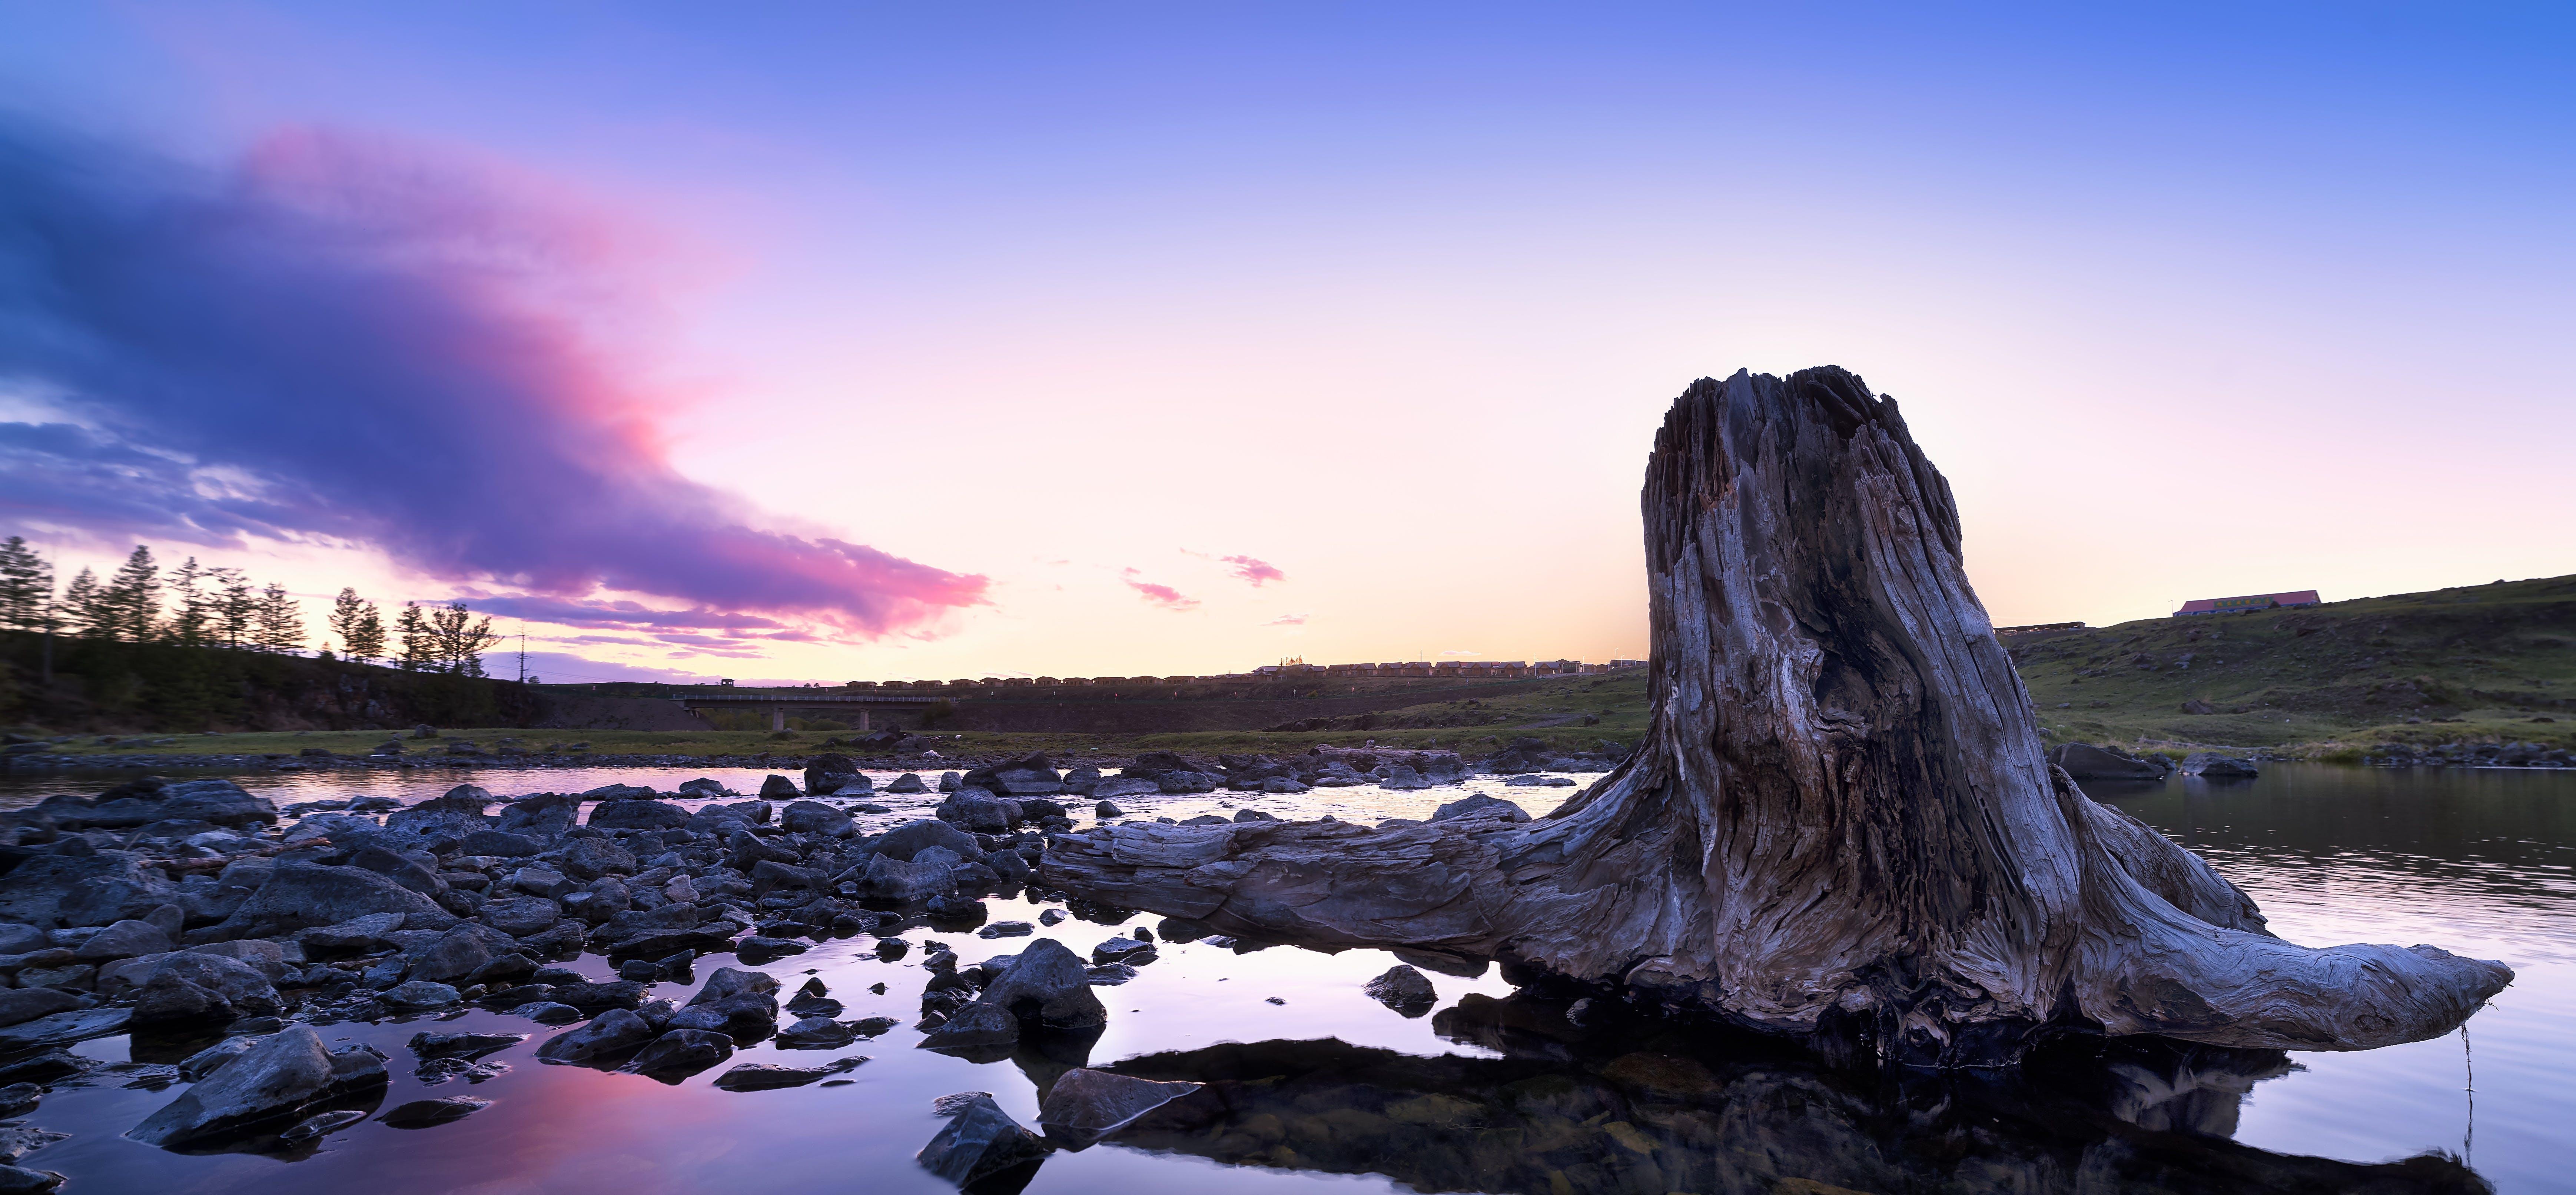 Tree Stump on Body of Water